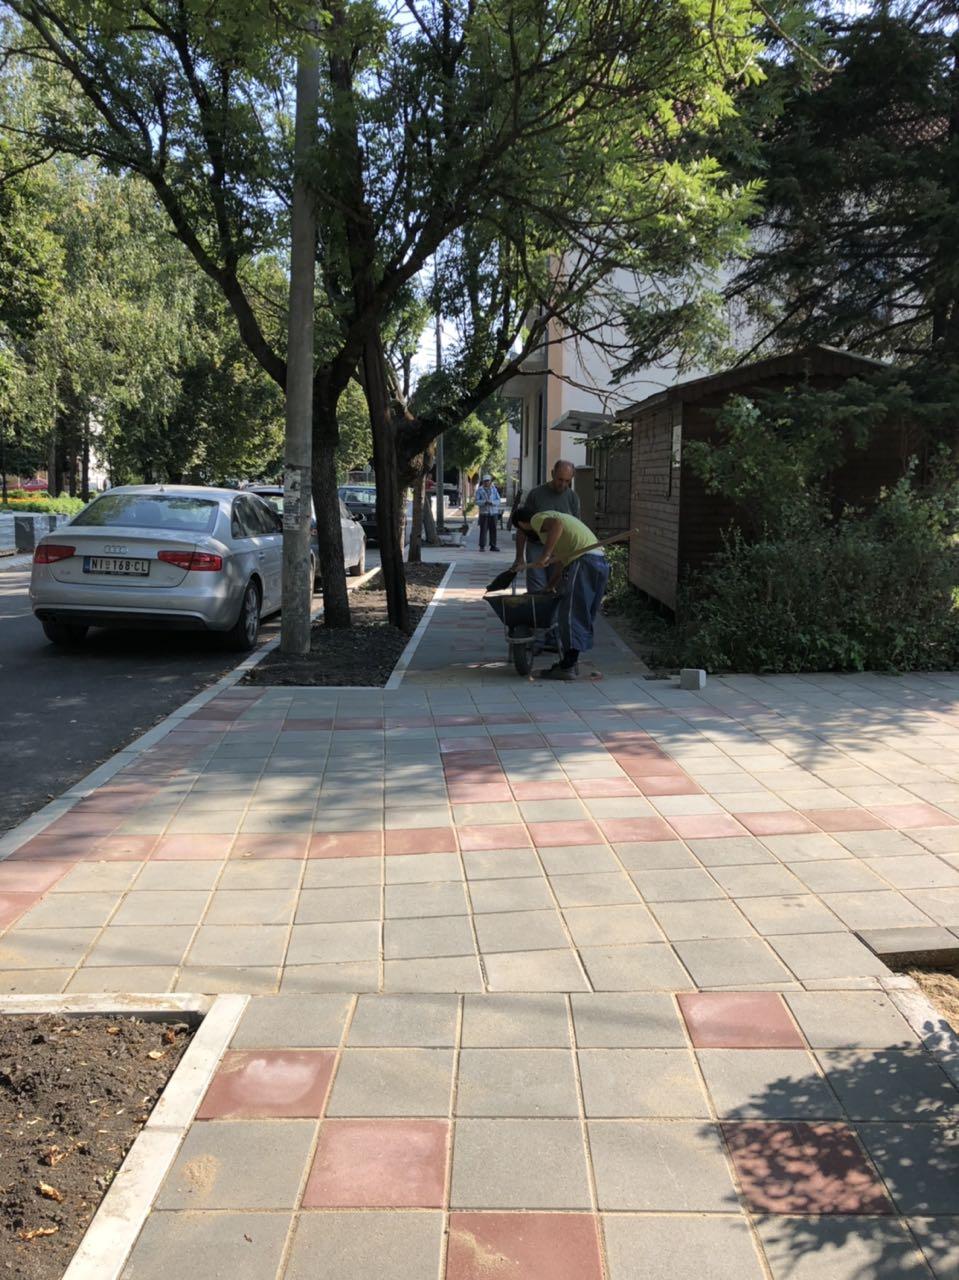 Završena rekonstrukcija ulice Bore Price